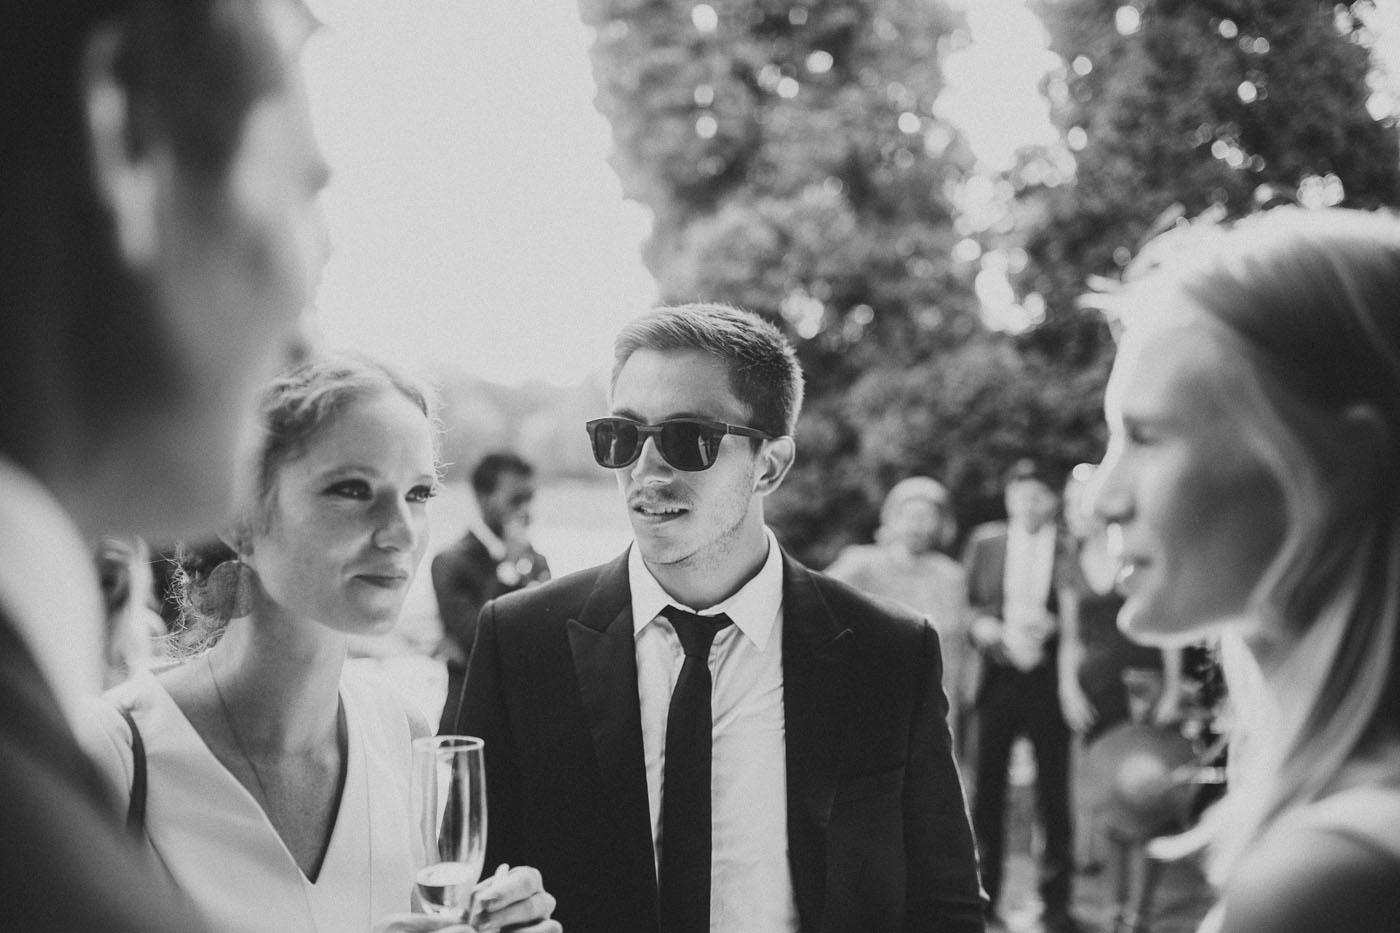 wedding-leopoldskron-salzburg-24